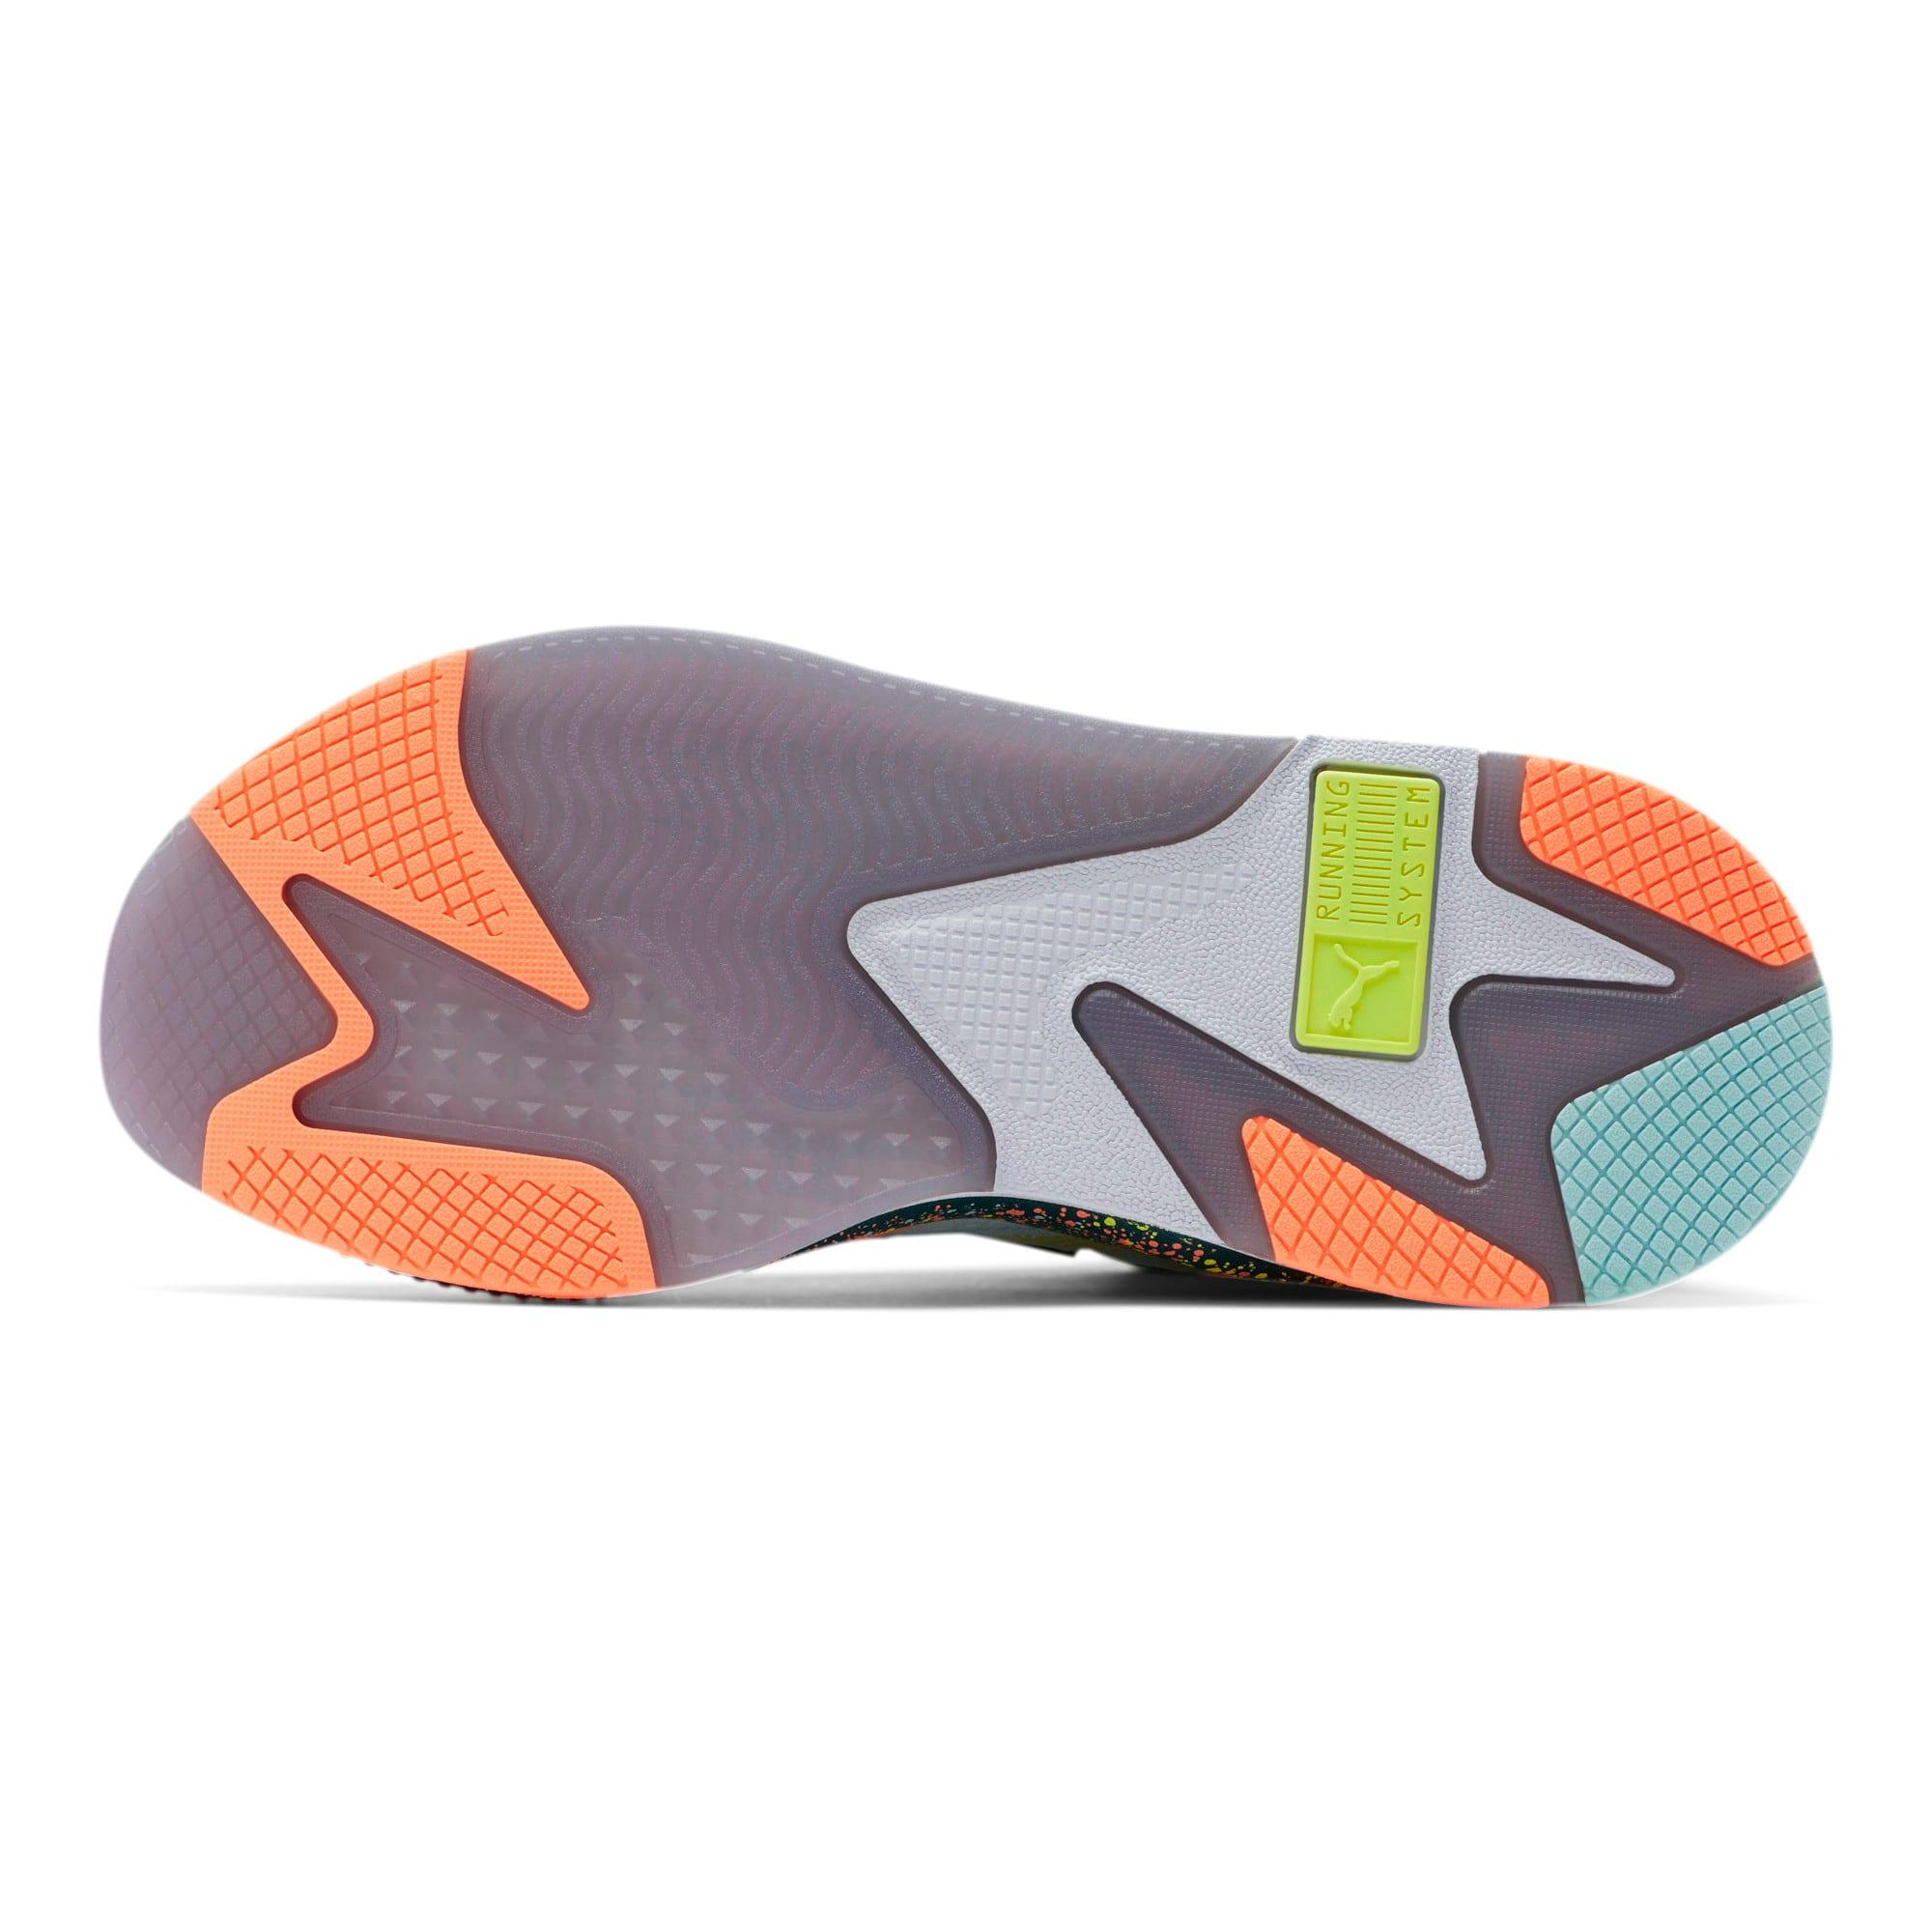 Thumbnail 4 of RS-X Fourth Dimension Men's Sneakers, Fair Aqua-Ponderosa Pine, medium